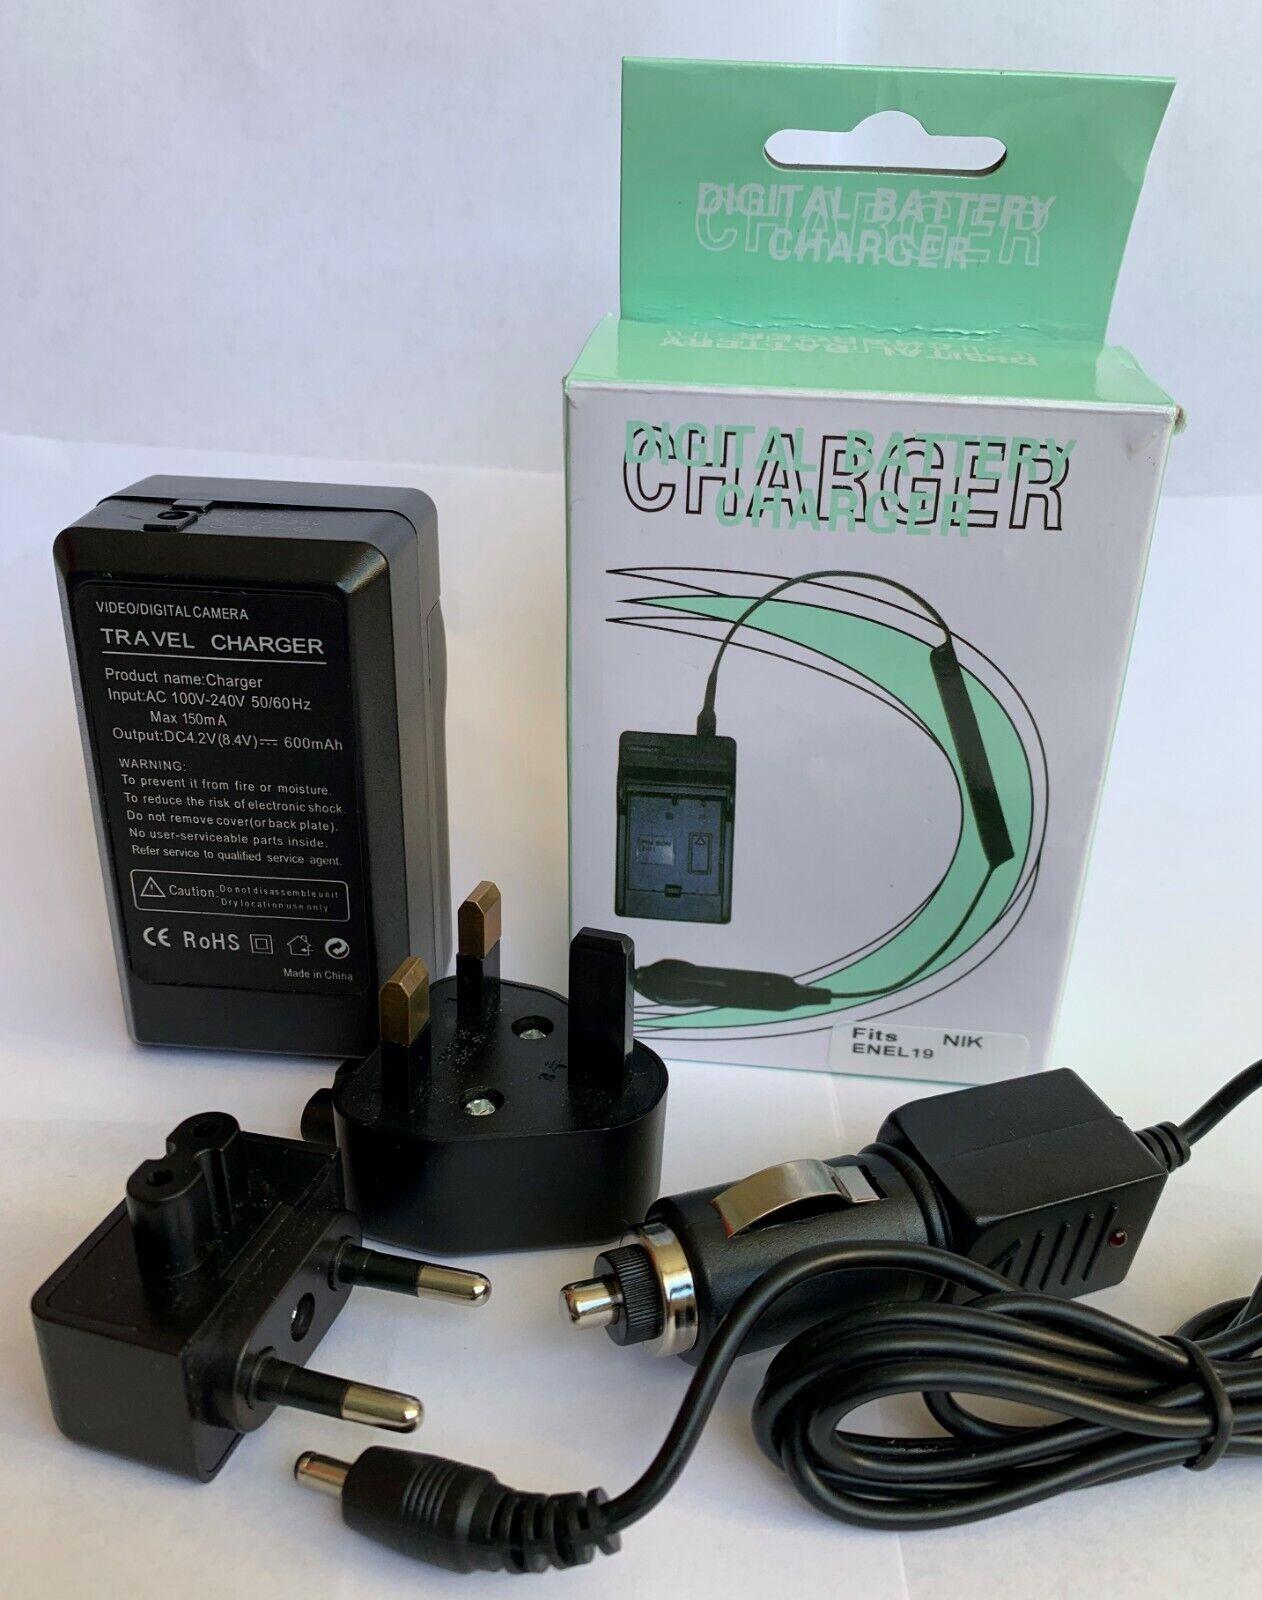 Charger for Nikon EN-EL19 Digital Camera Battery Main UK & EU Plug, Car charger